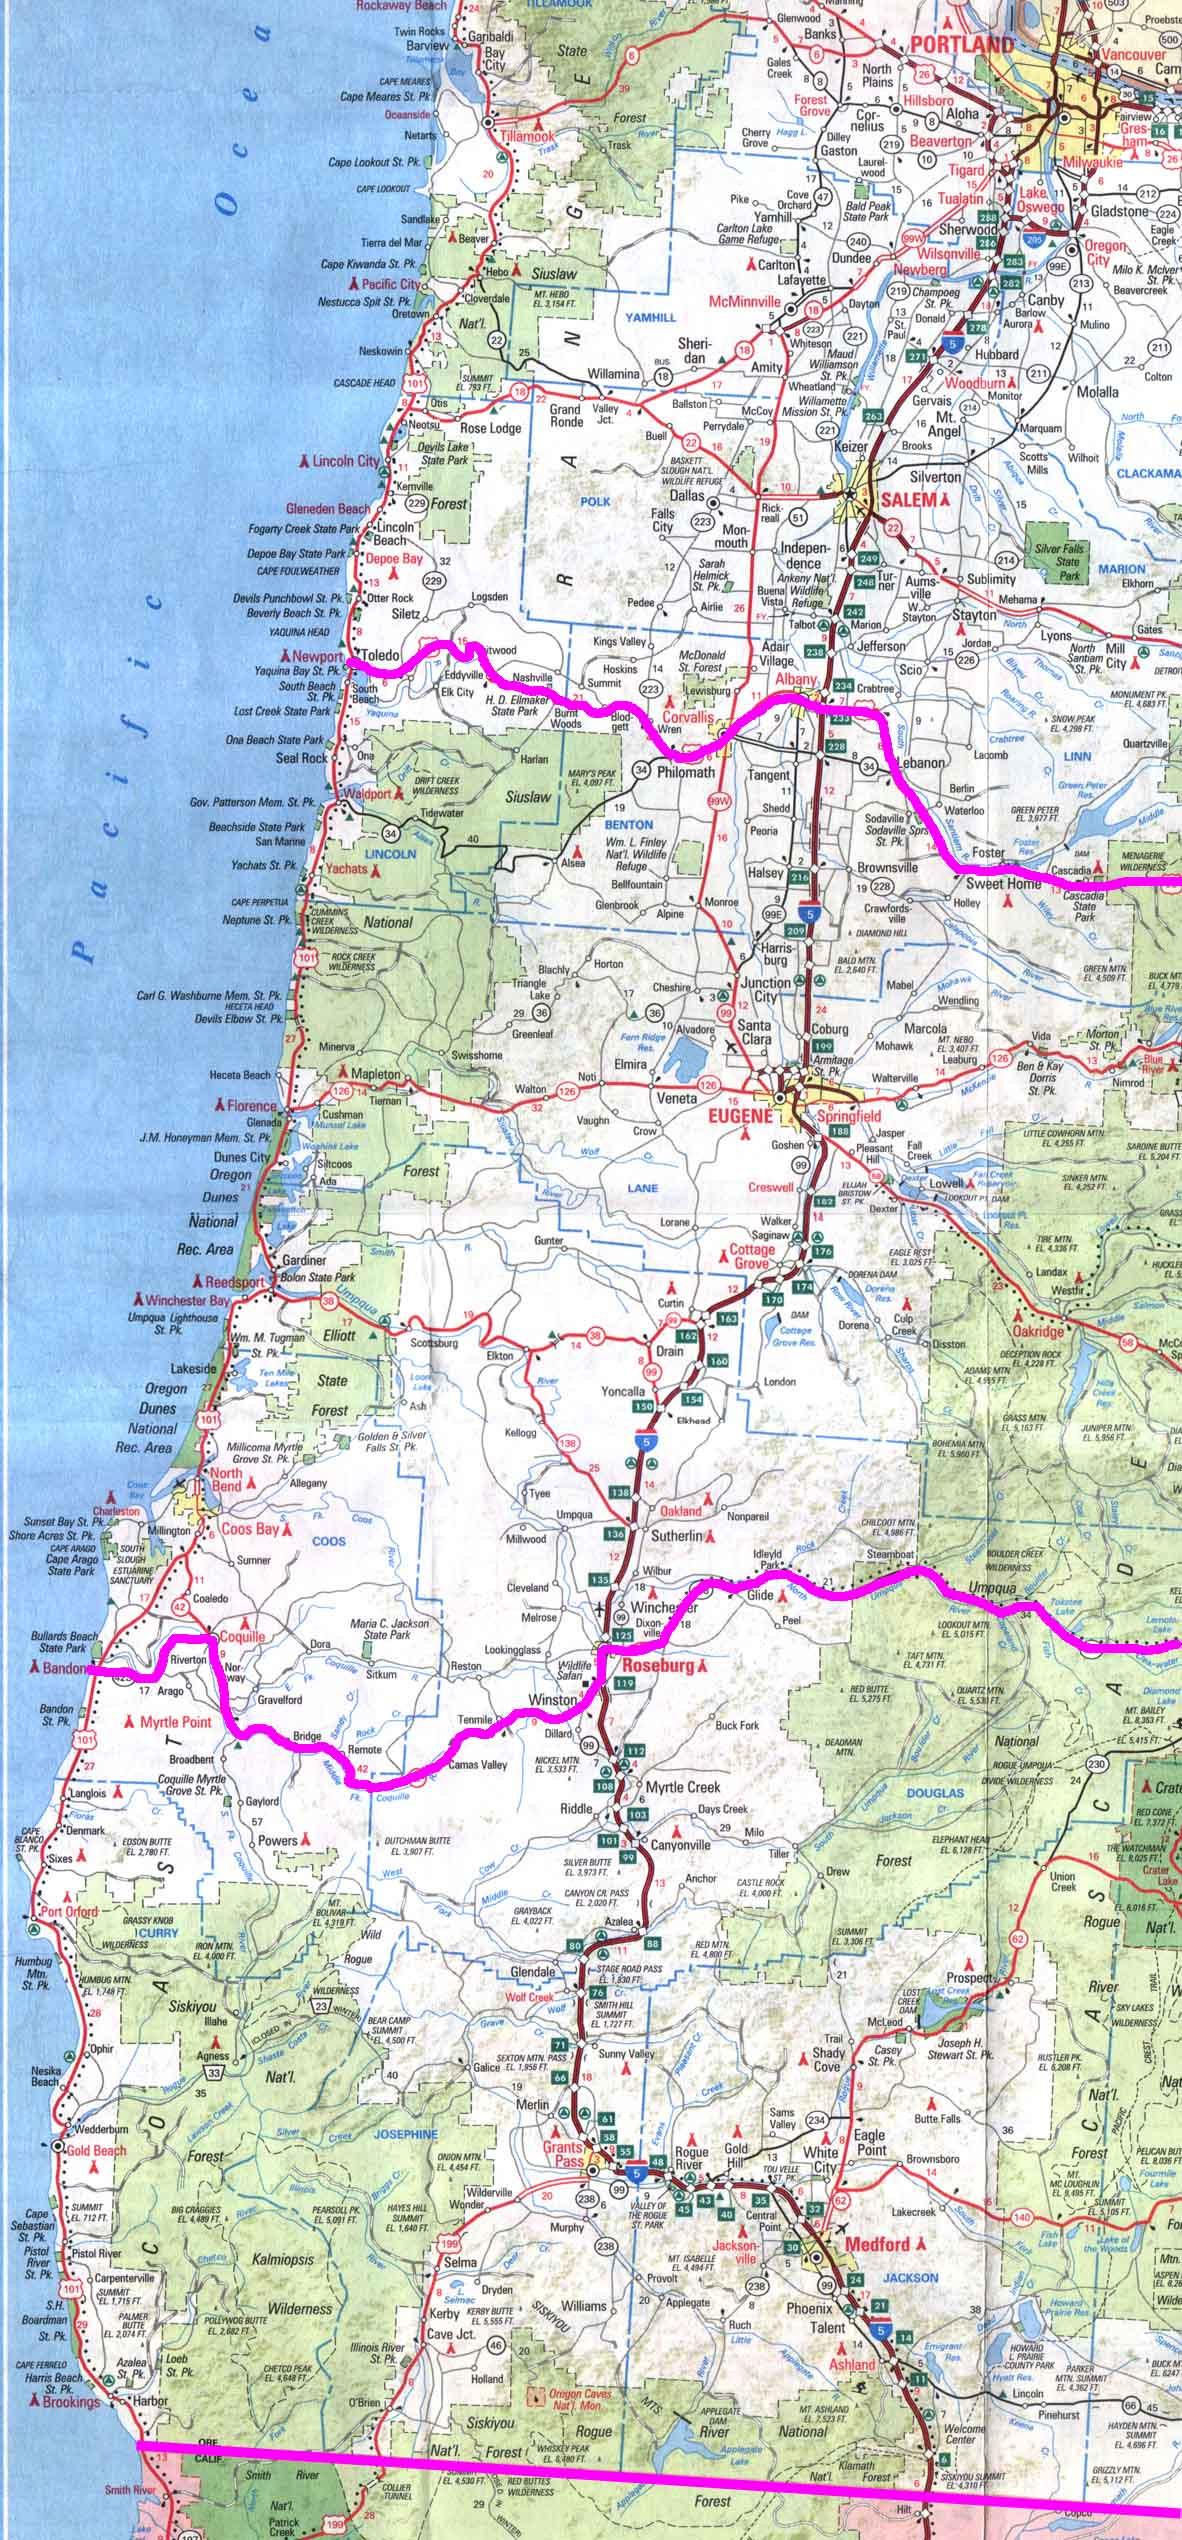 Map Of California Oregon And Washington Valid Map Reference - California Oregon Washington Map